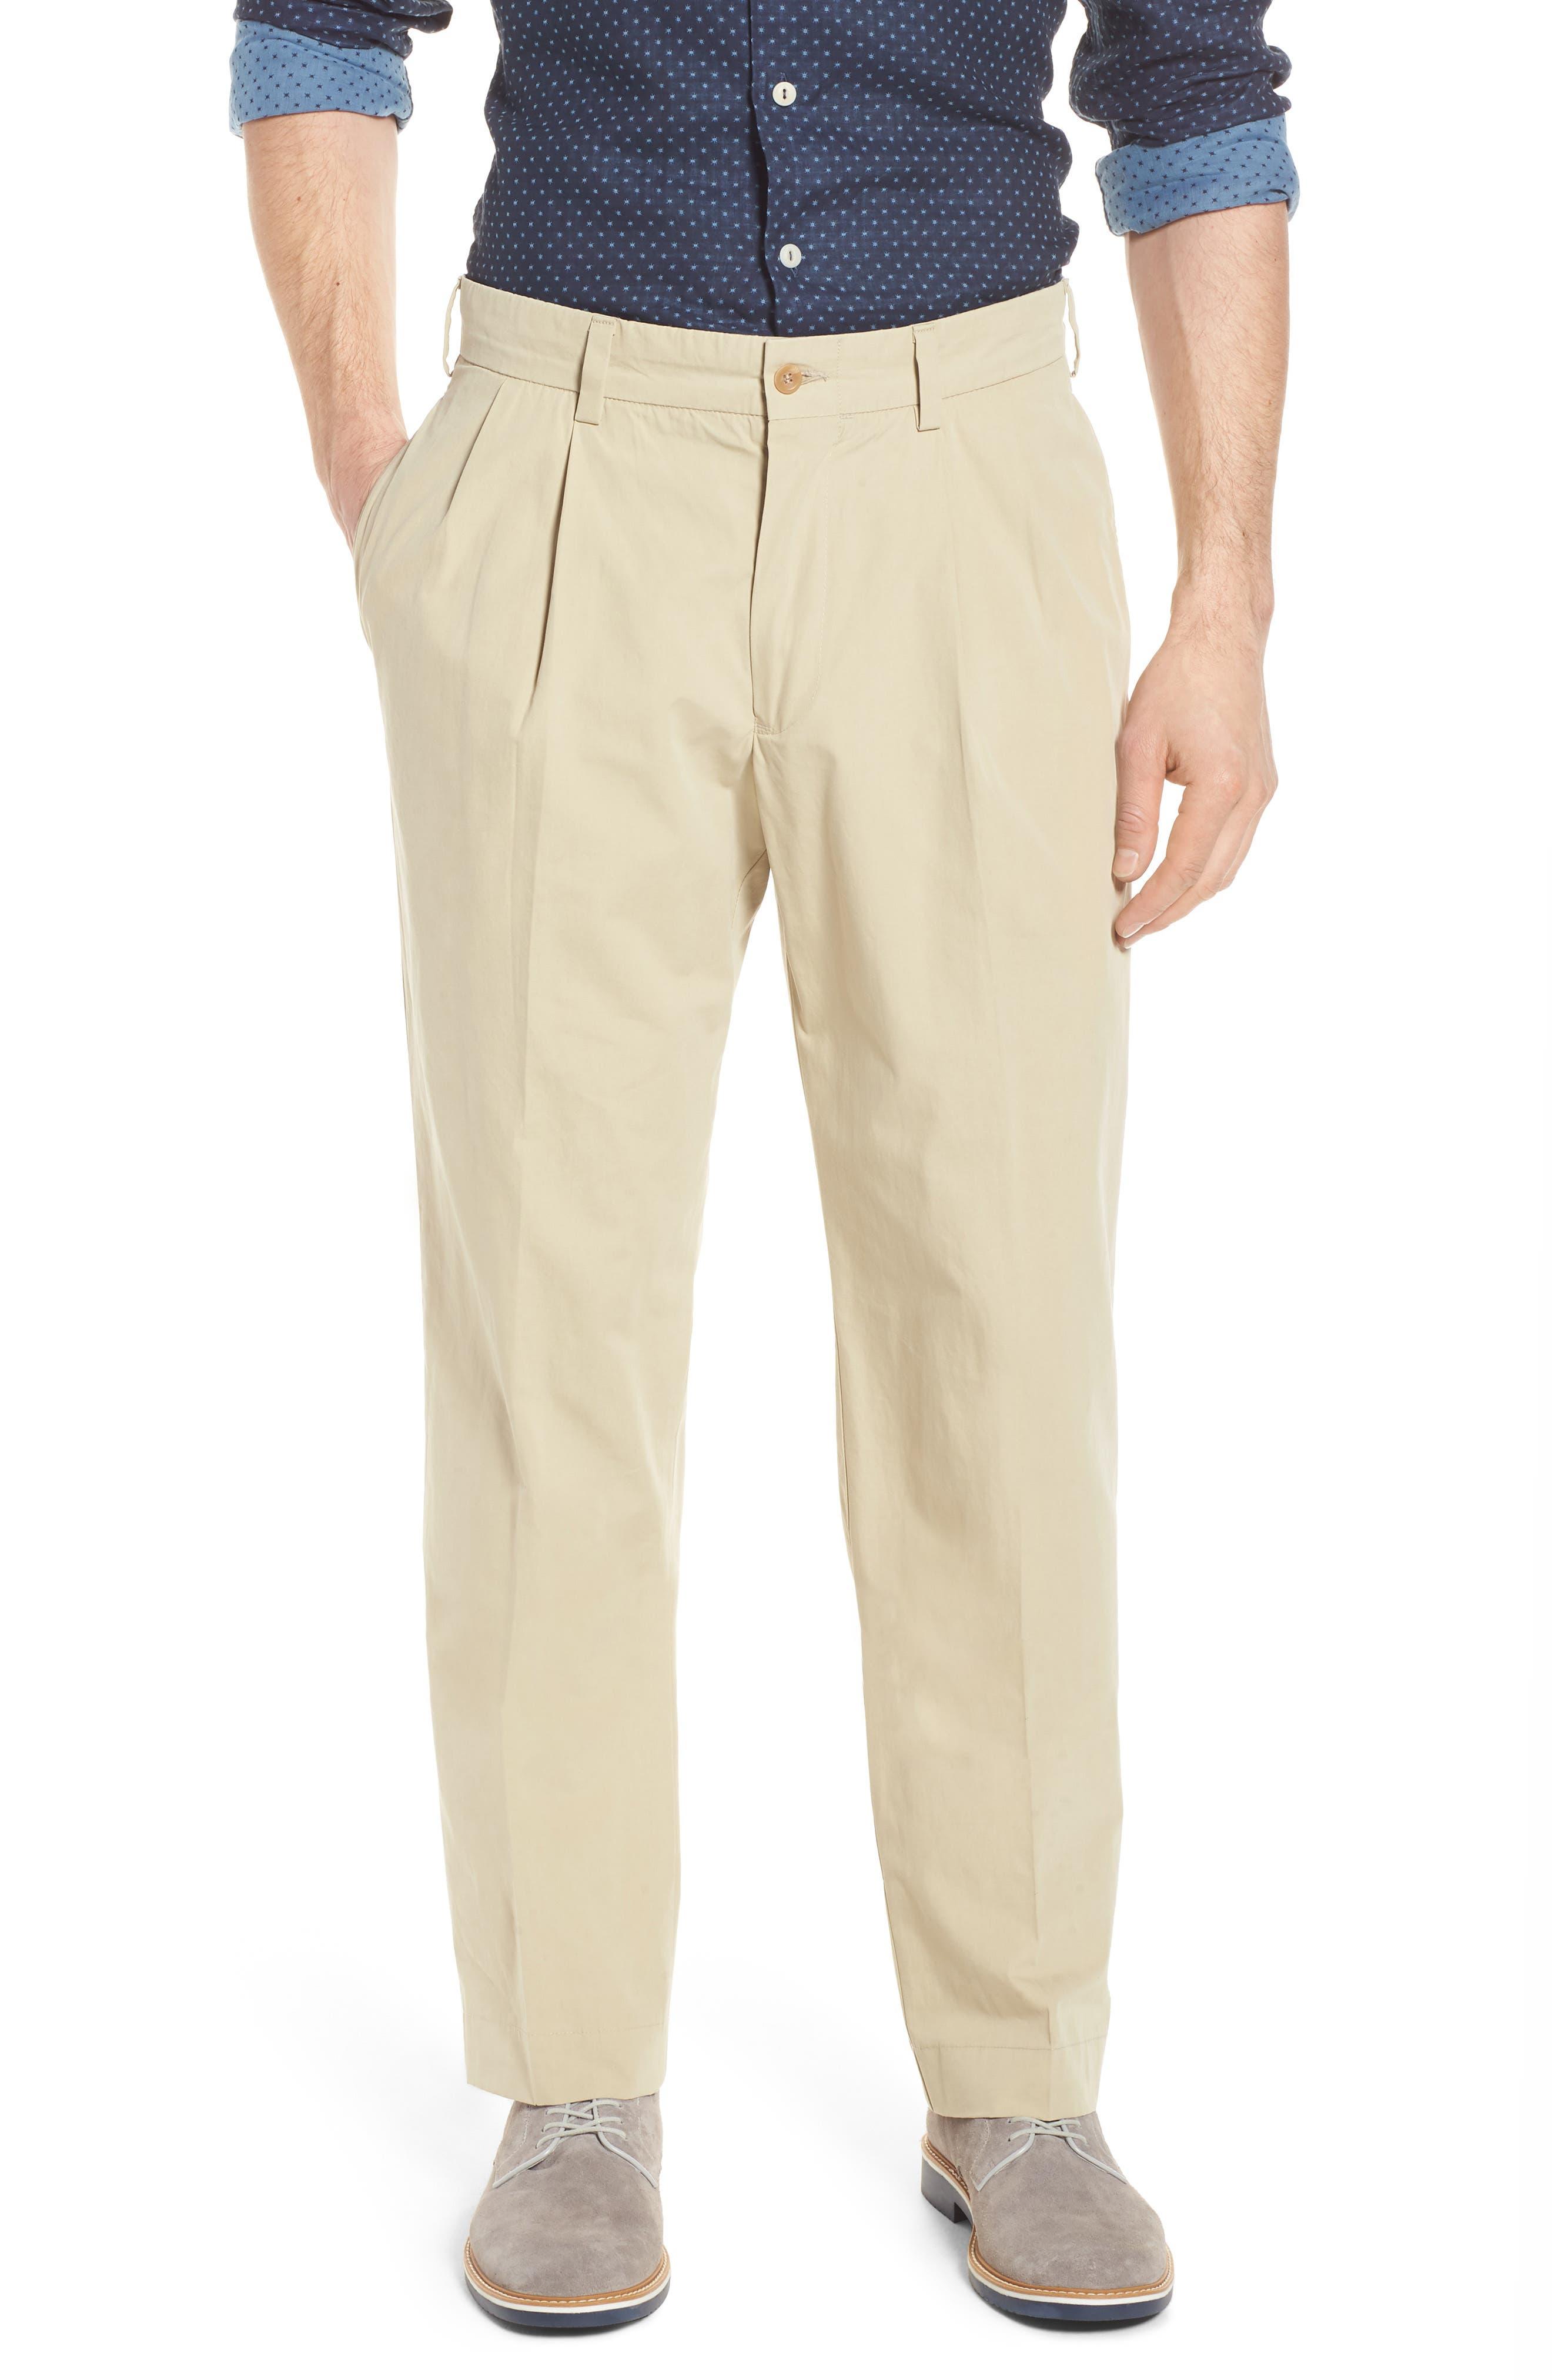 M2 Classic Fit Pleated Tropical Cotton Poplin Pants,                             Main thumbnail 1, color,                             Khaki